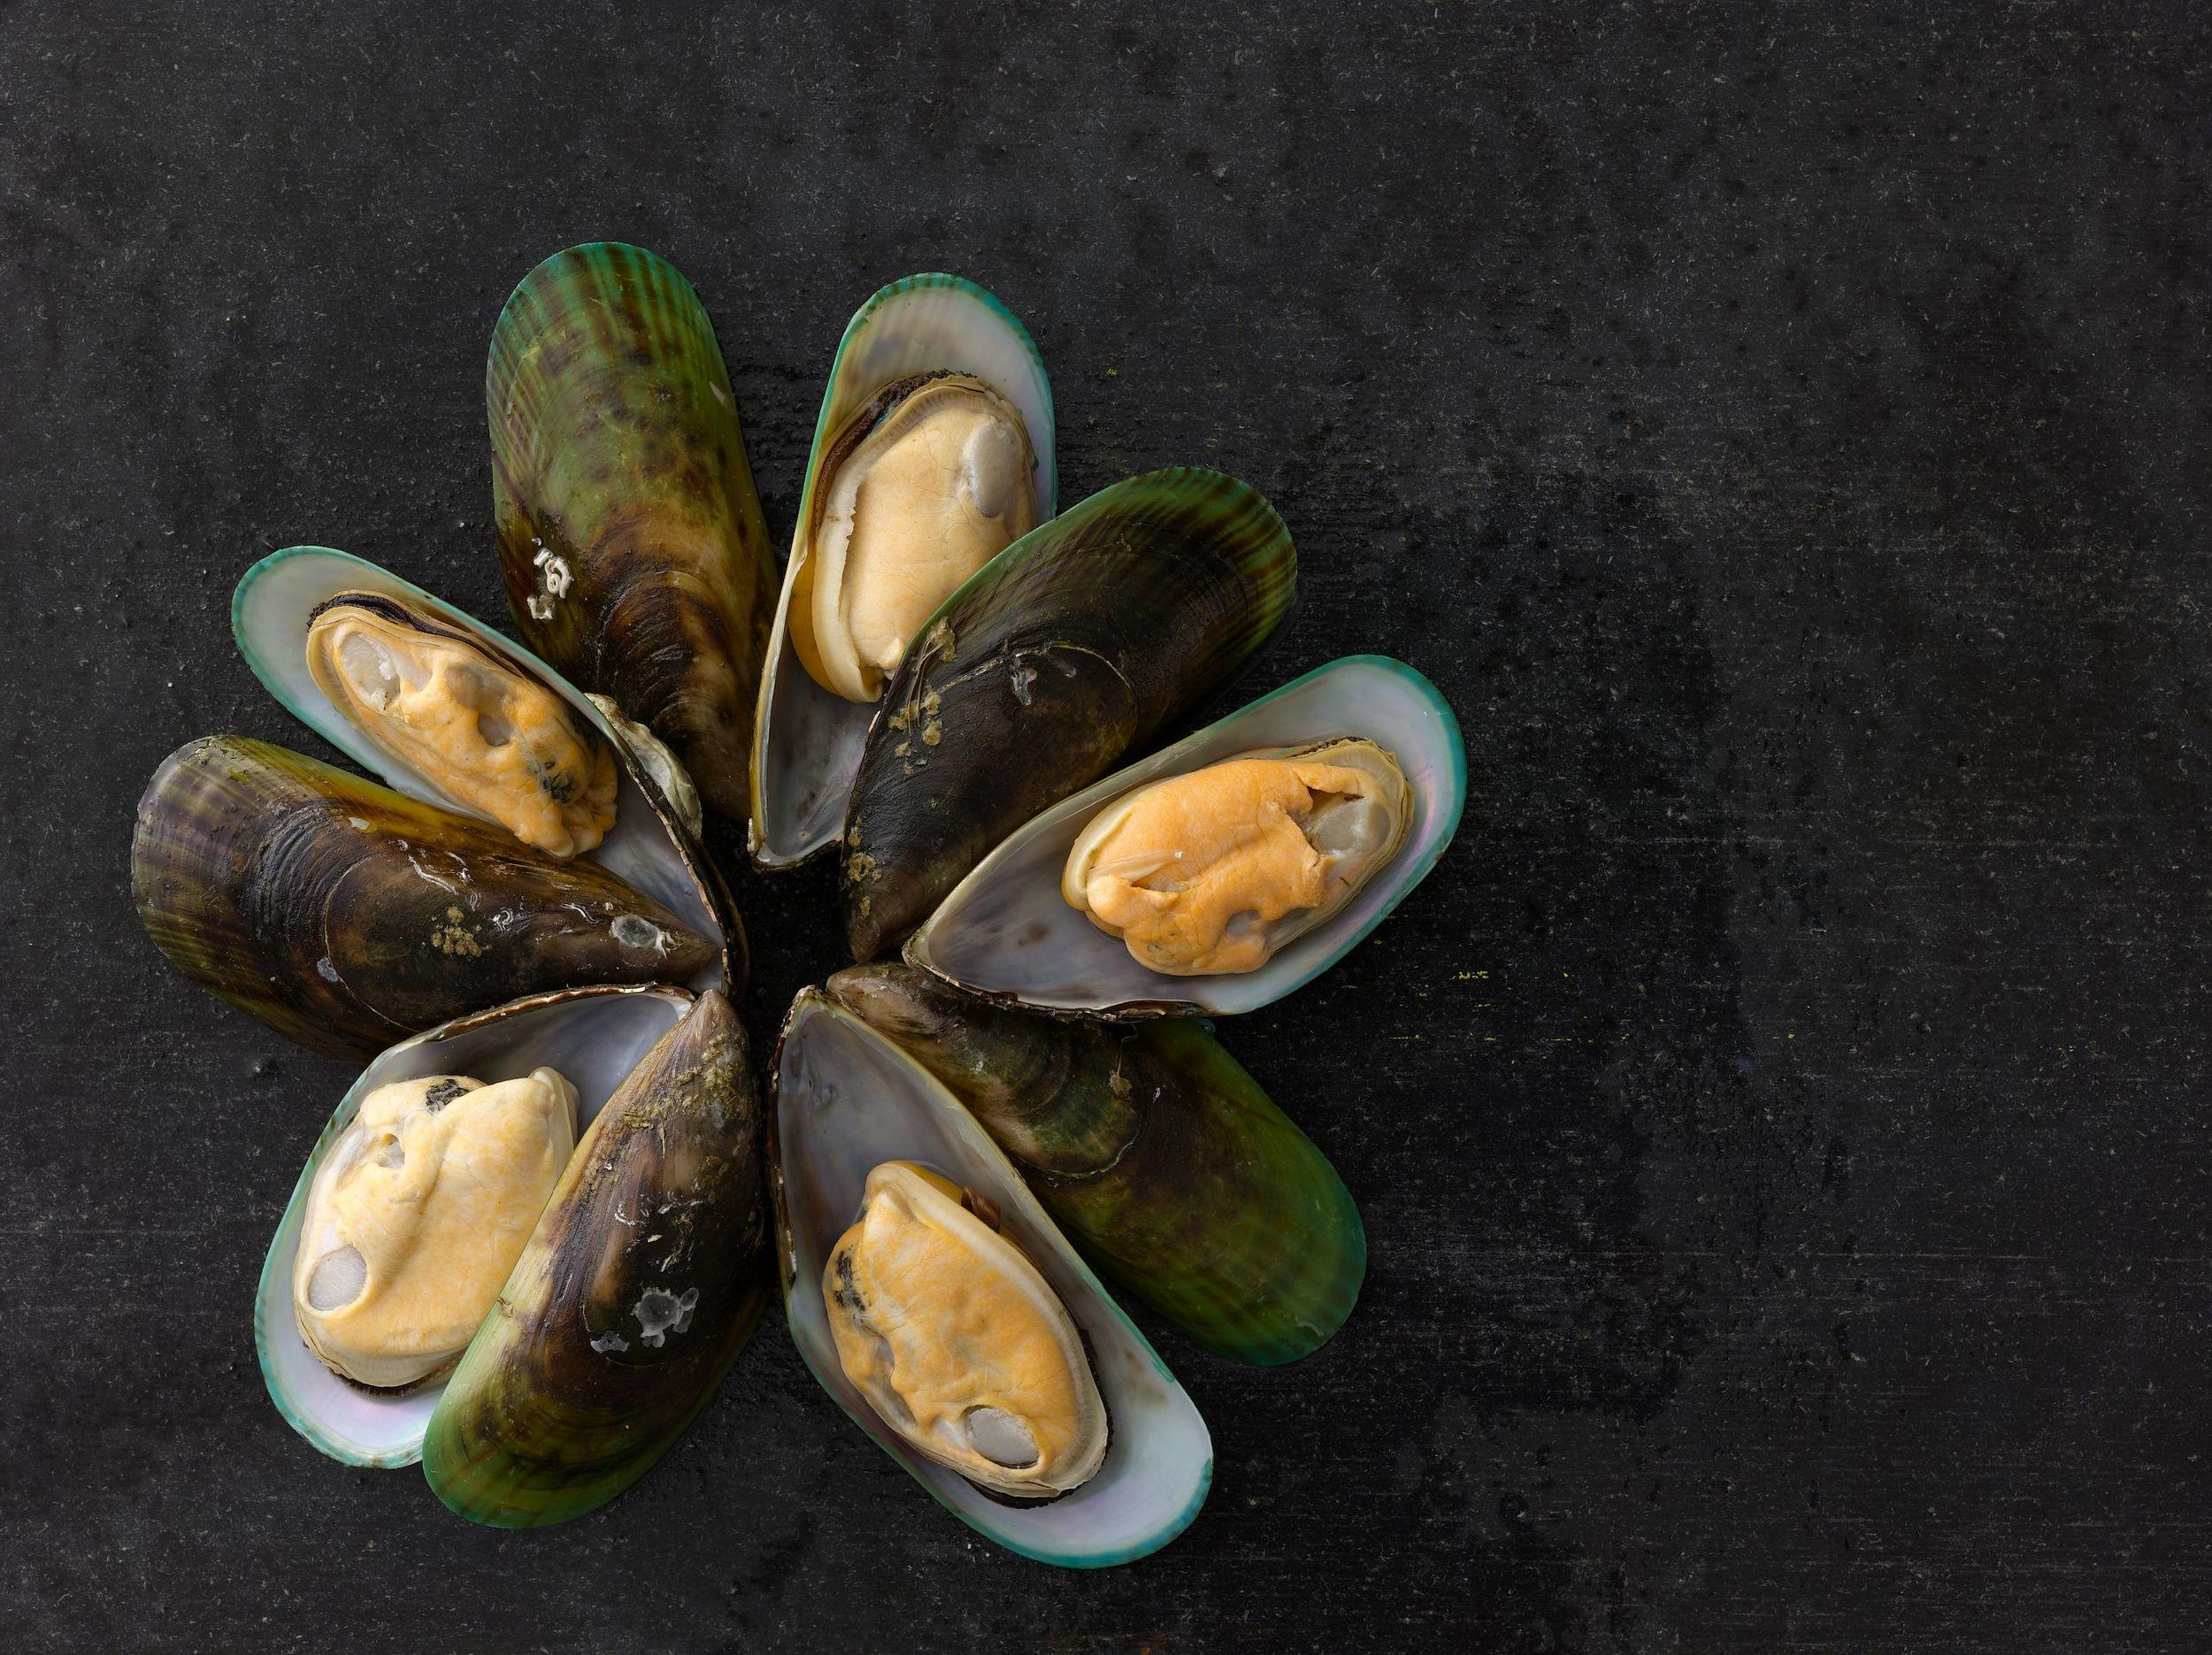 Mussels_329.jpg